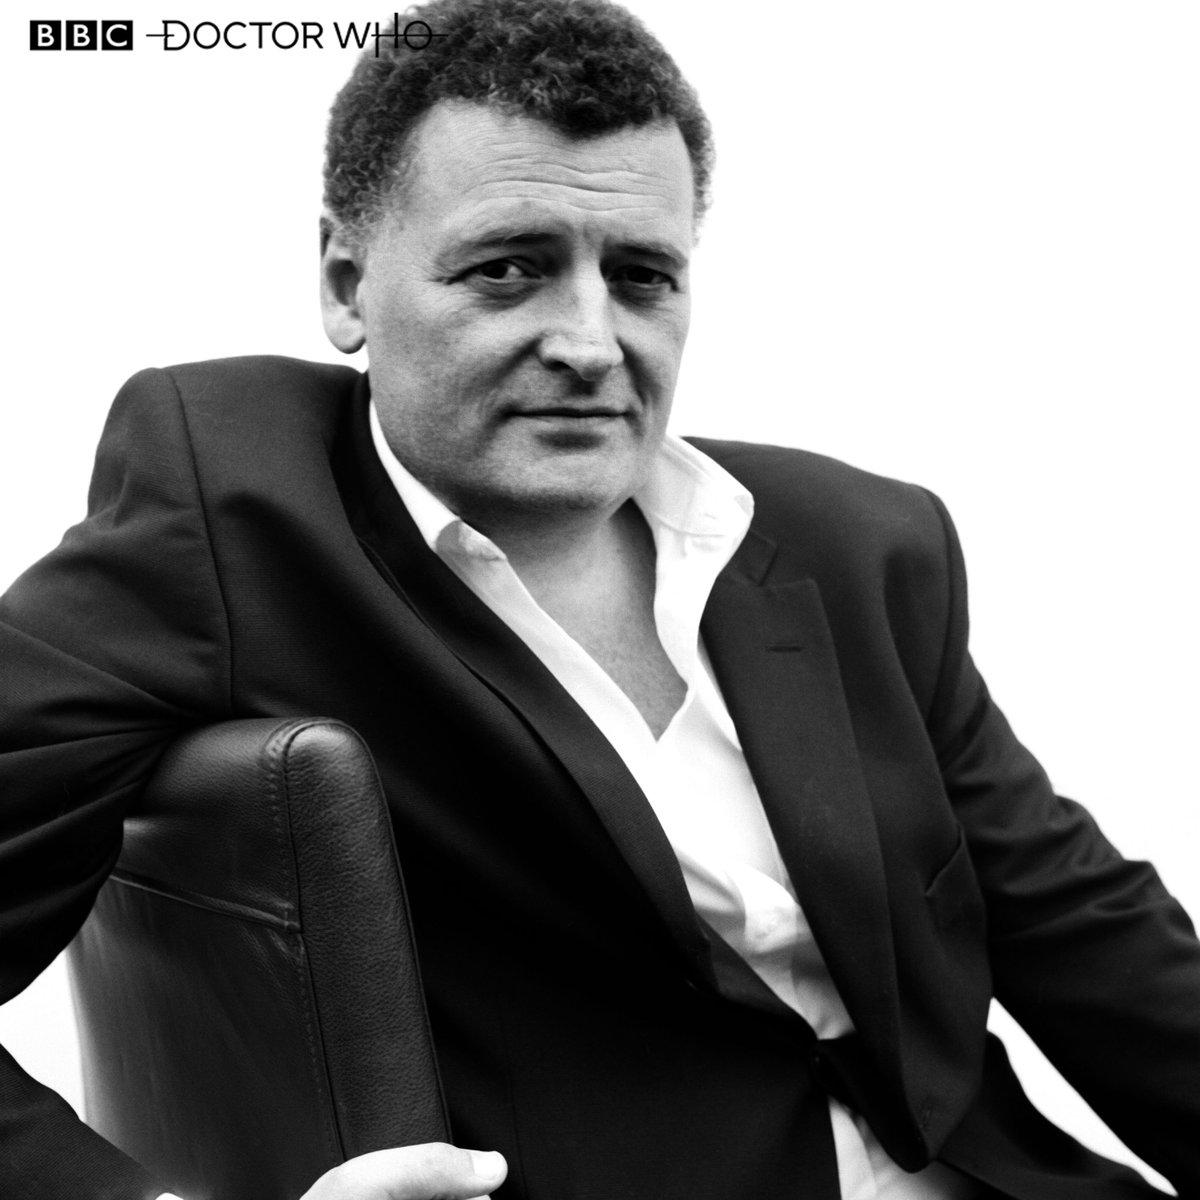 Happy Birthday Steven Moffat! 🎉 #DoctorWho